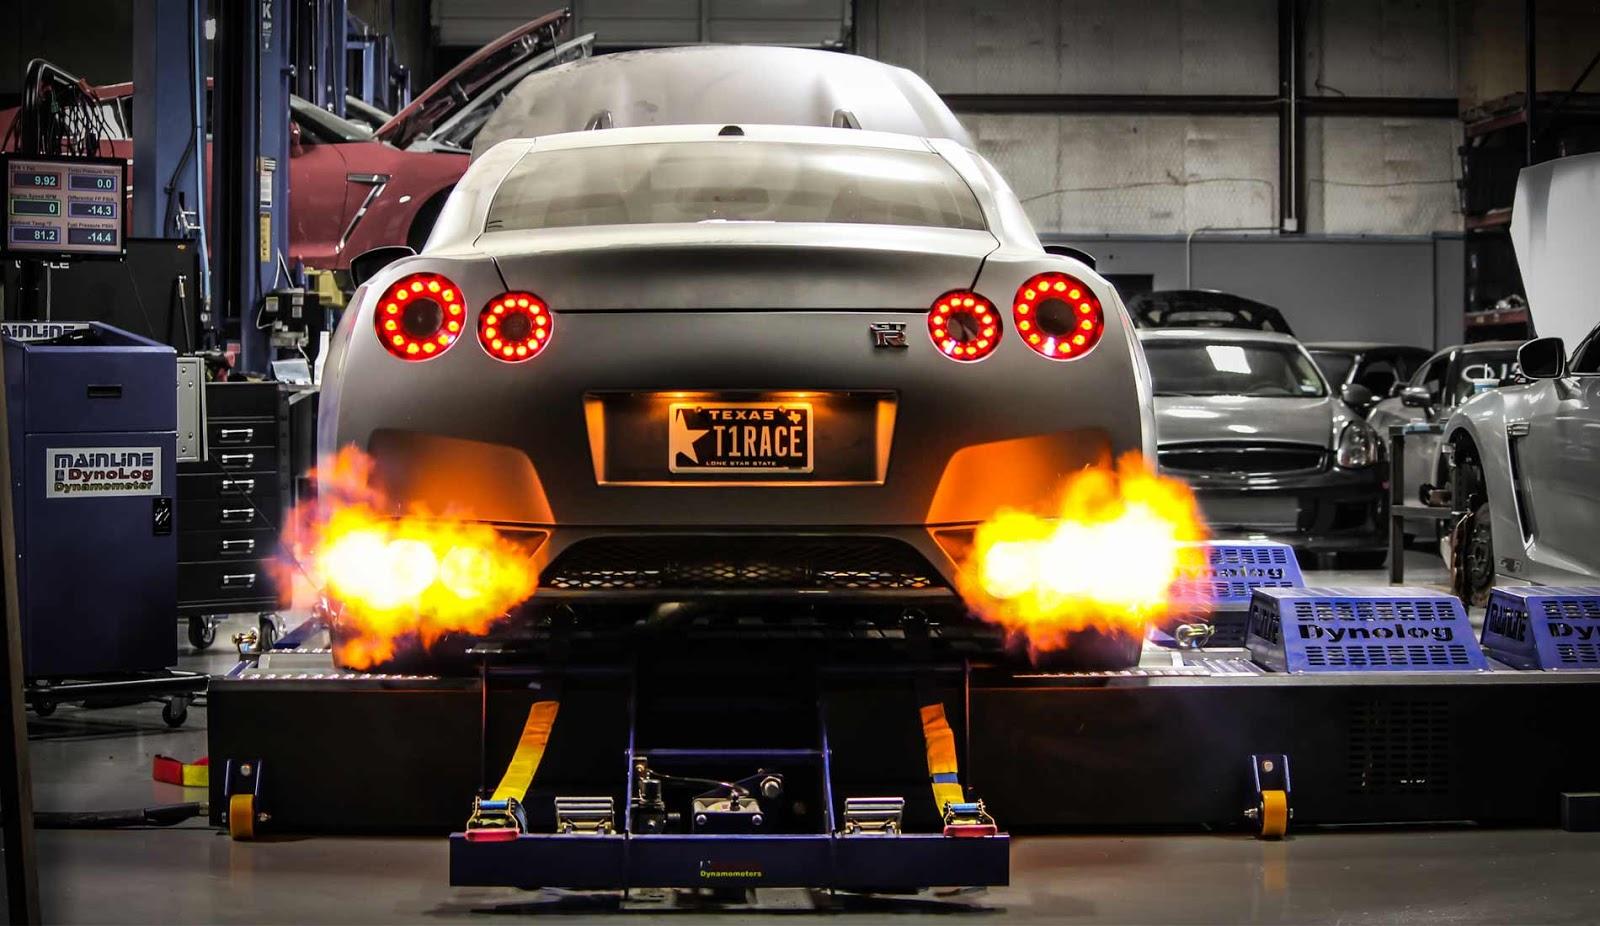 Nissan2BGT R Δες ένα Nissan GT-R 2000 ίππων να χάνει τον έλεγχο στα 350 χ.α.ω!